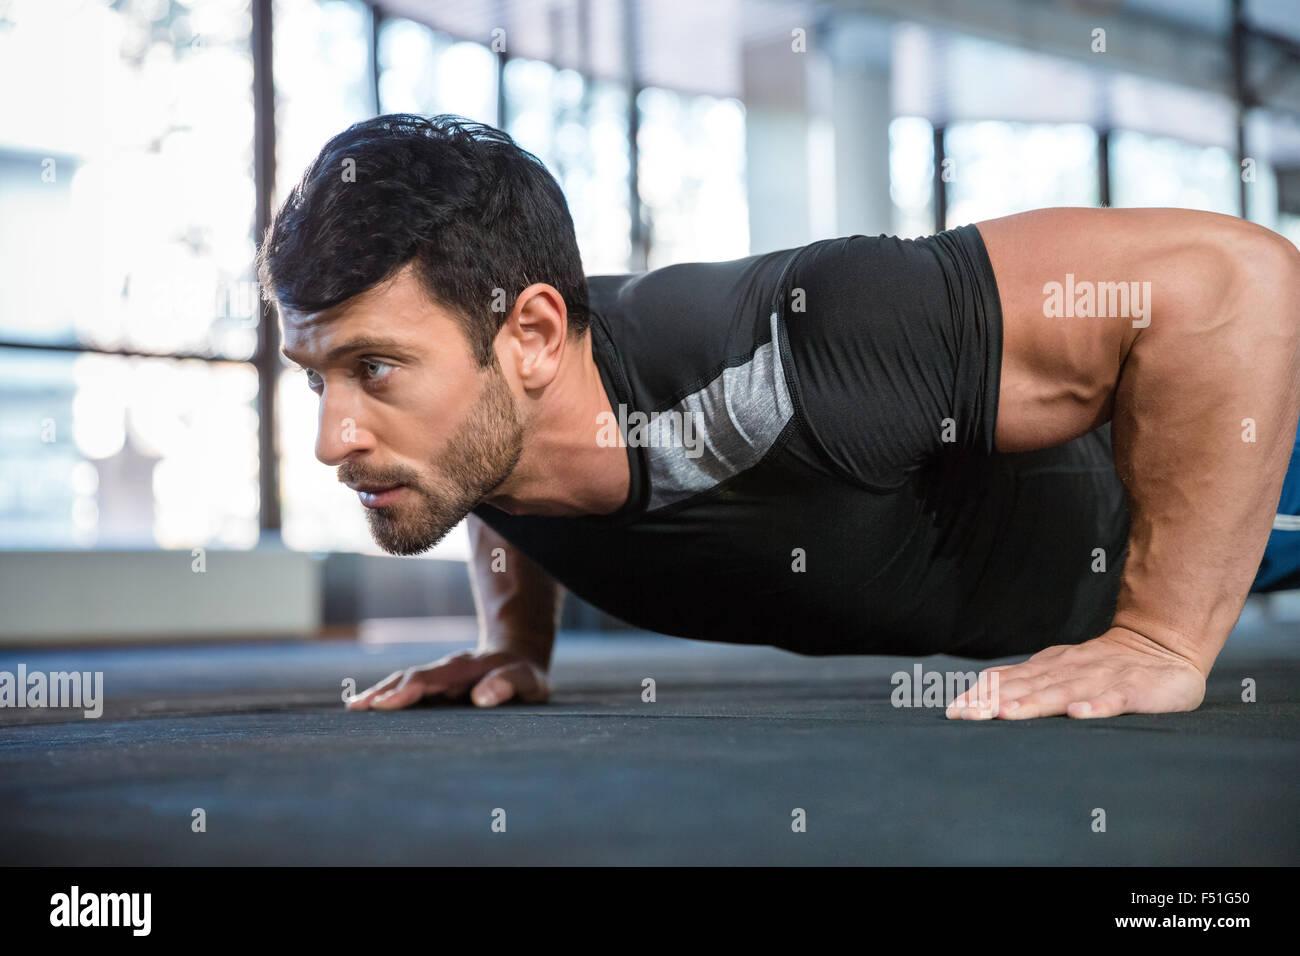 Athlet wearing black t-shirt training arms - Stock Image